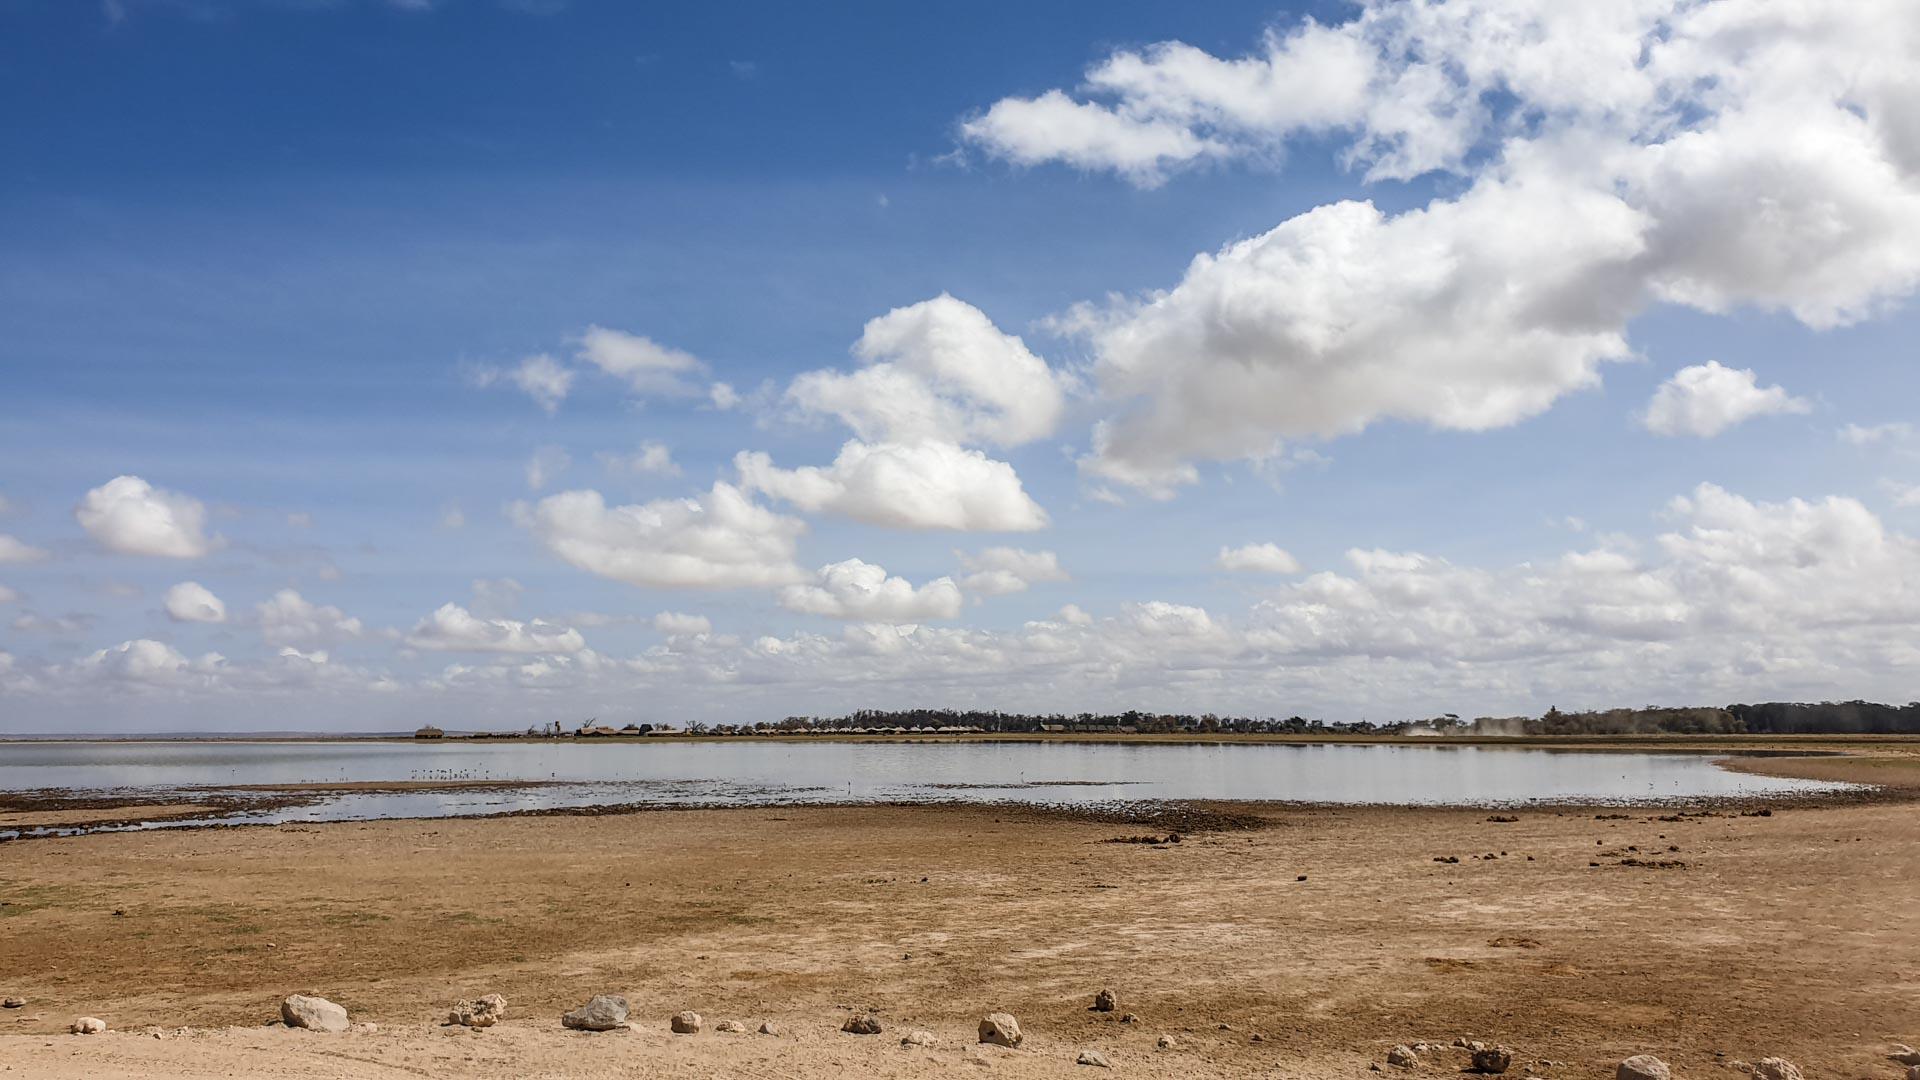 Laguna en el Parque Nacional de Amboseli, Kenia